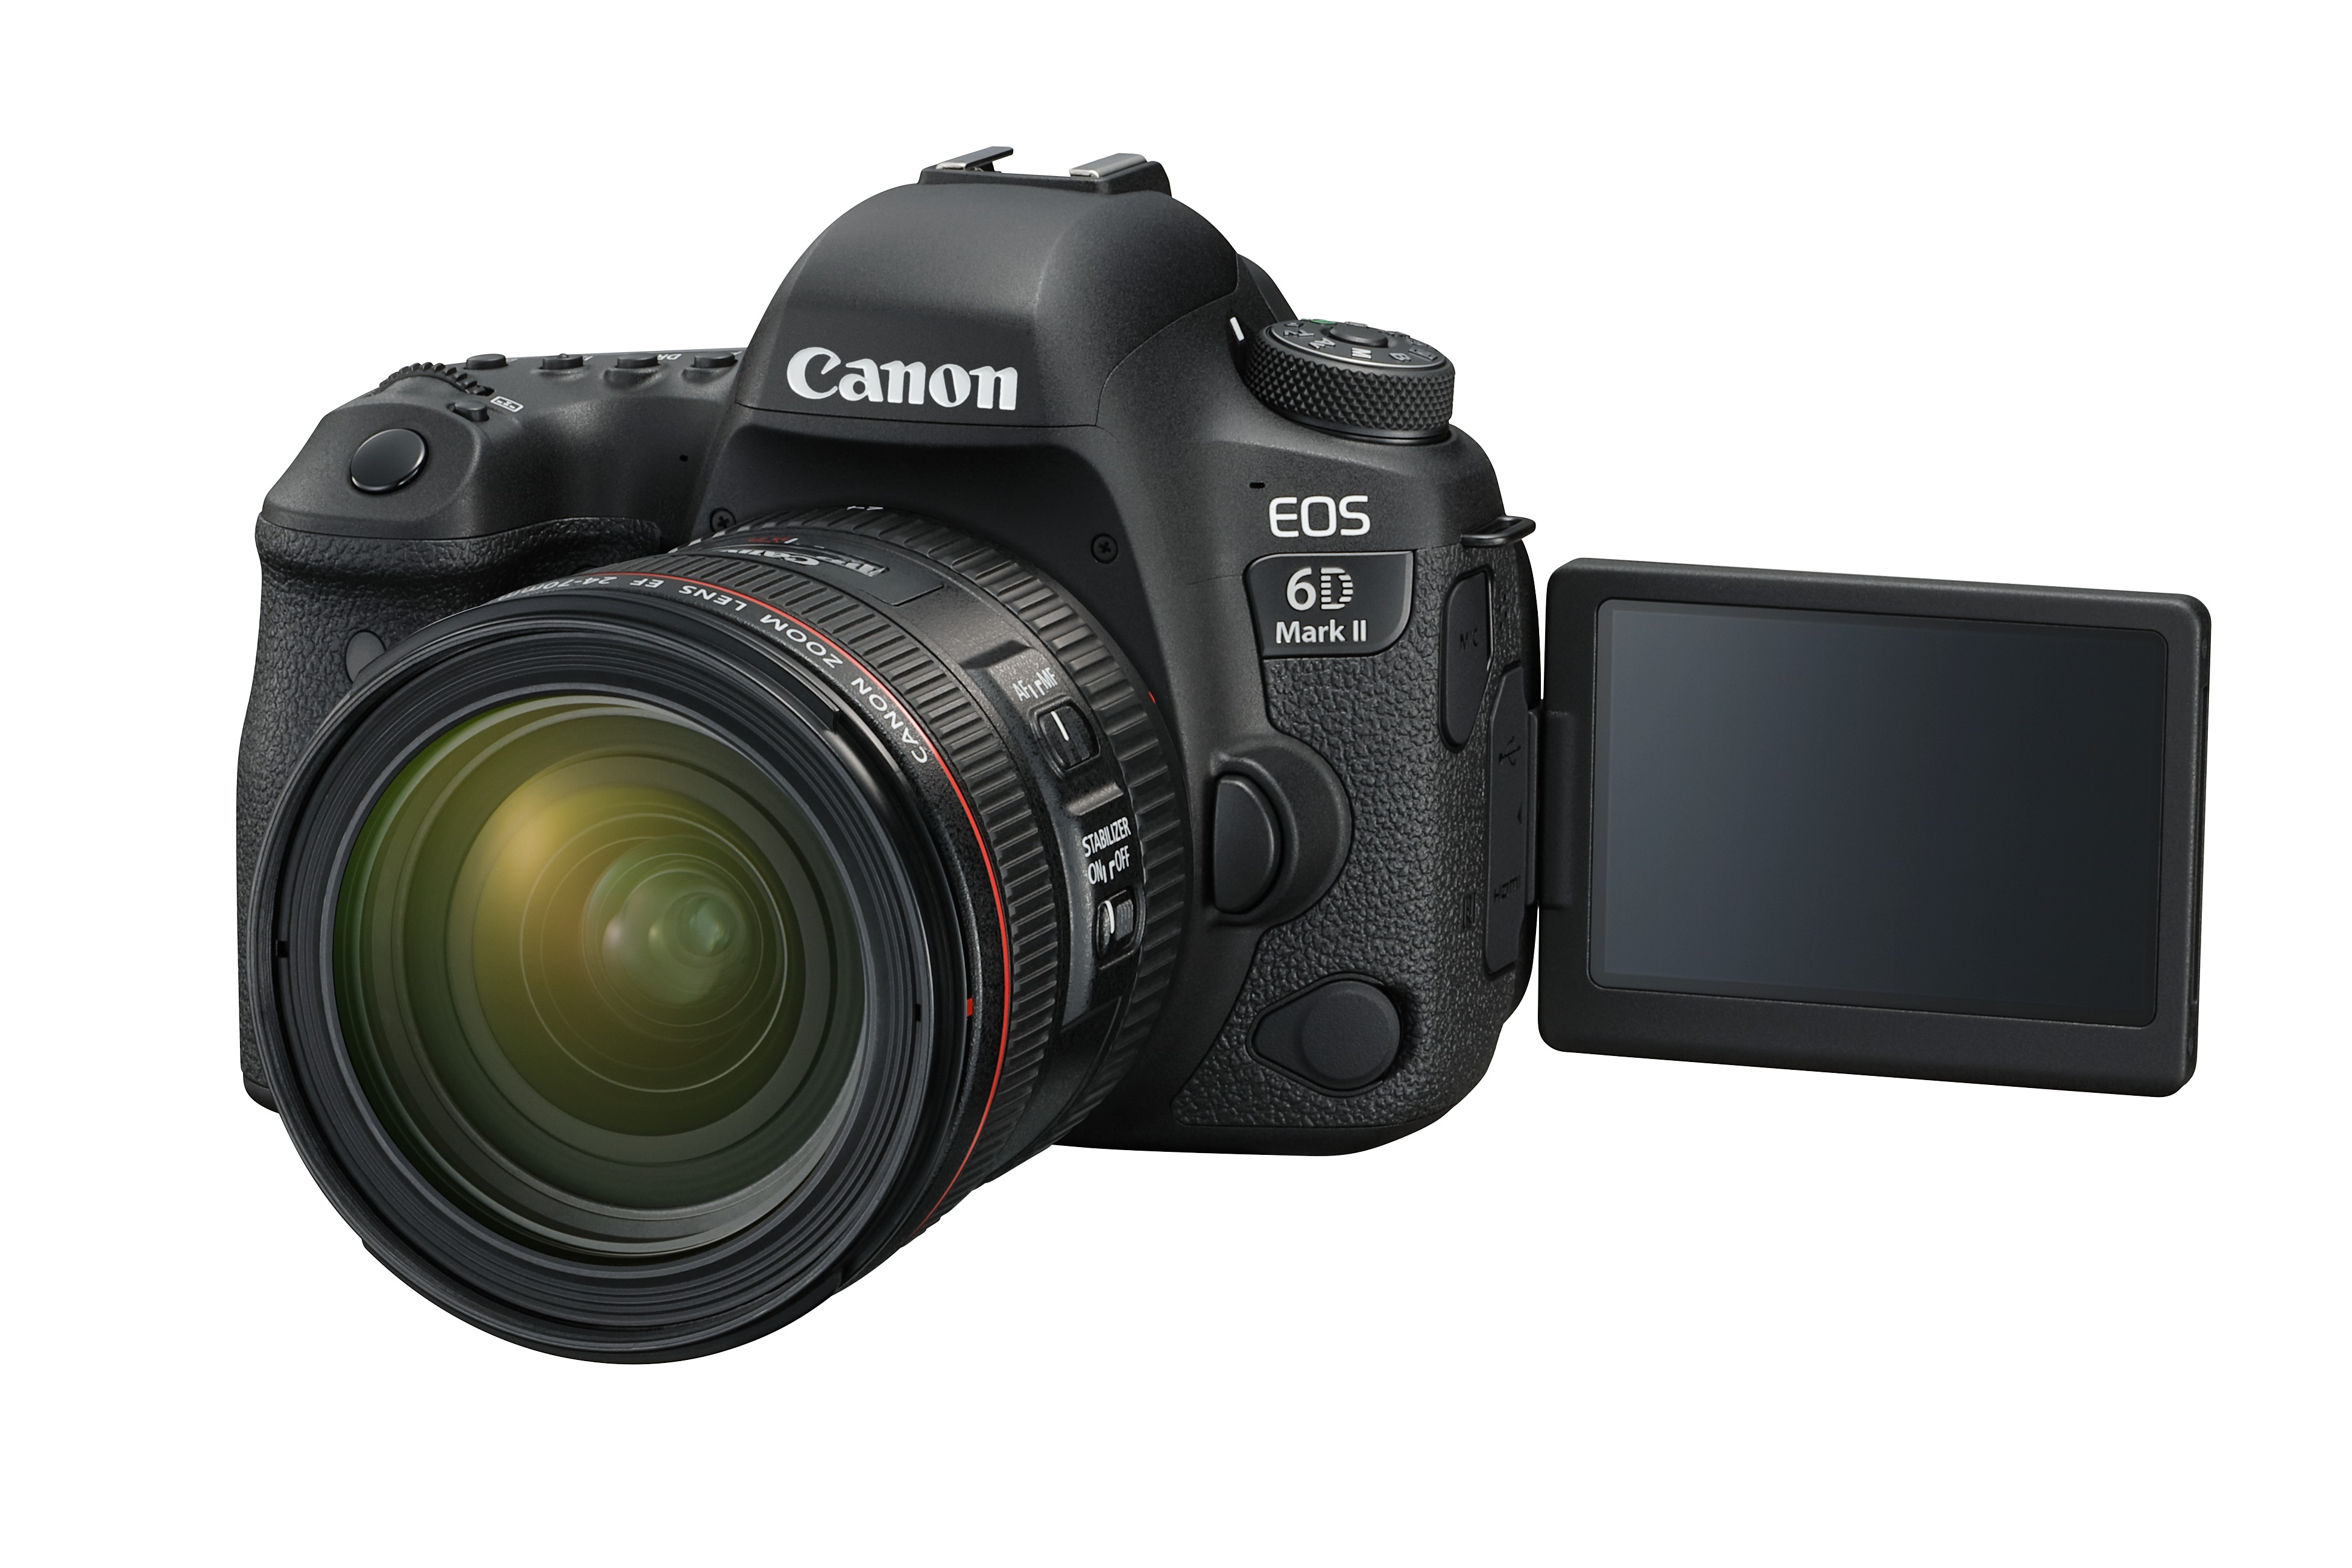 Canon Eos 6d Mark Ii Vs Canon Eos 6d Is It Worth